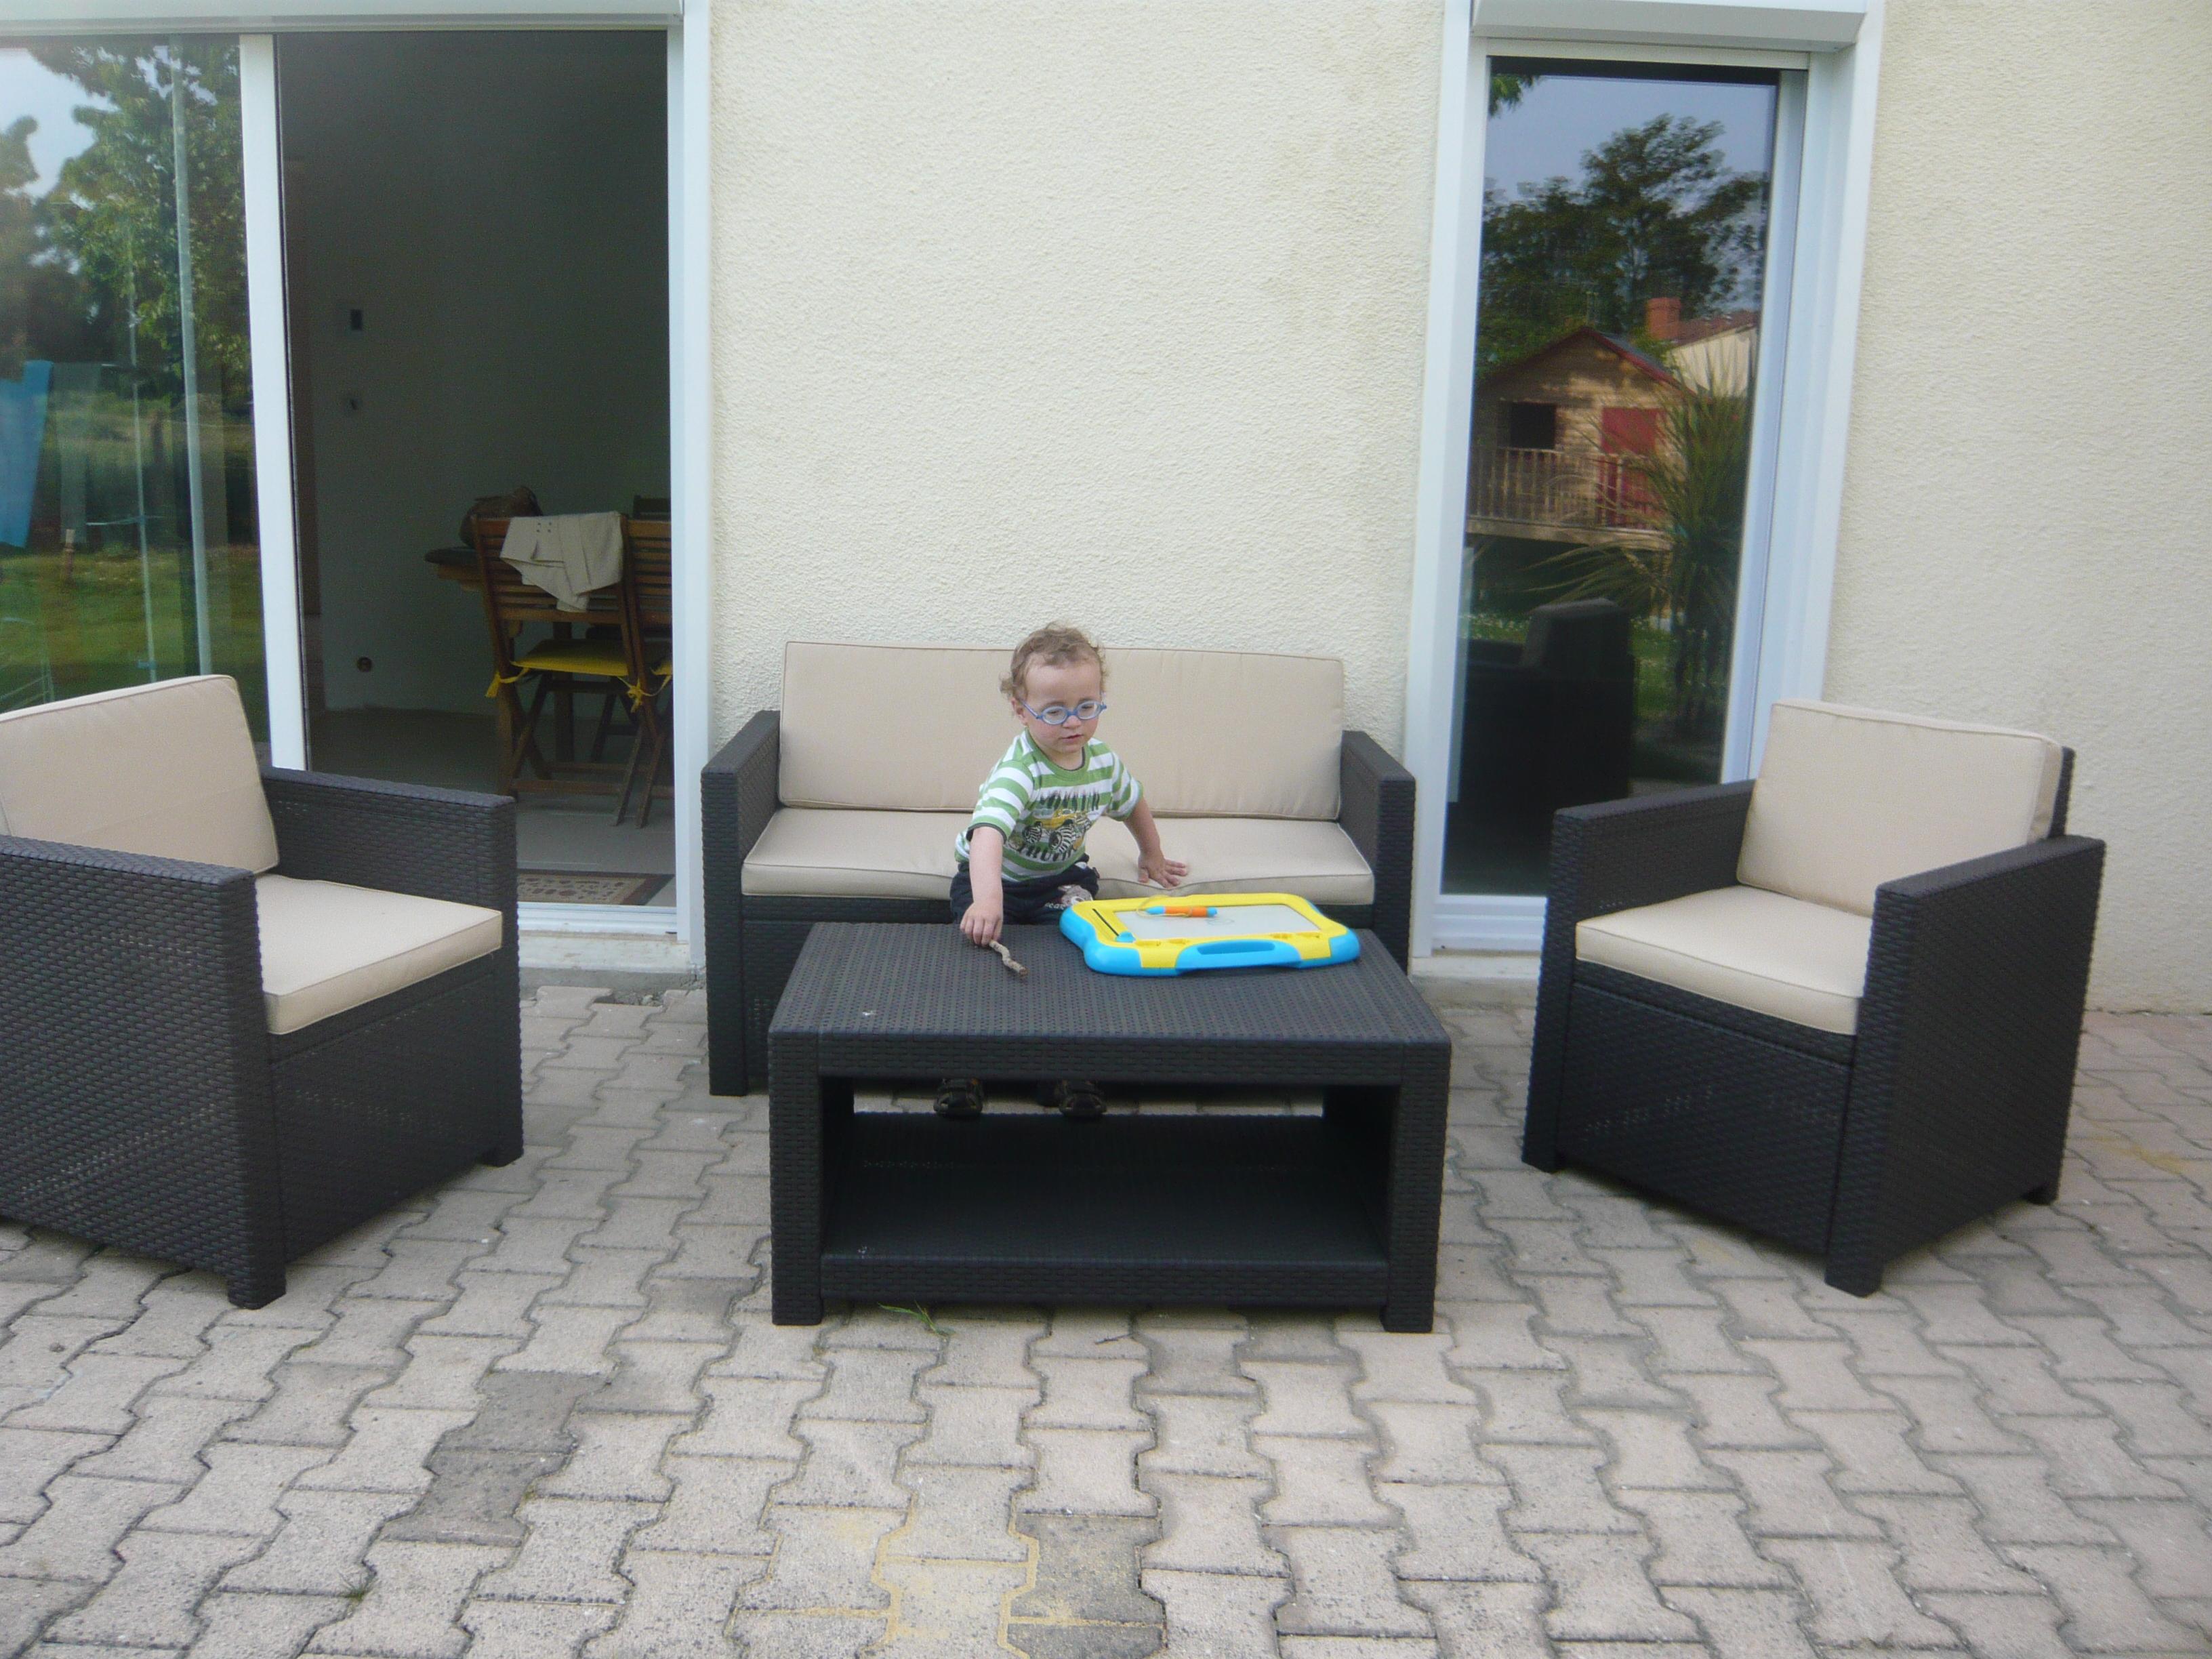 Salon De Jardin Ikea. la table basse en rotin une touche d ...